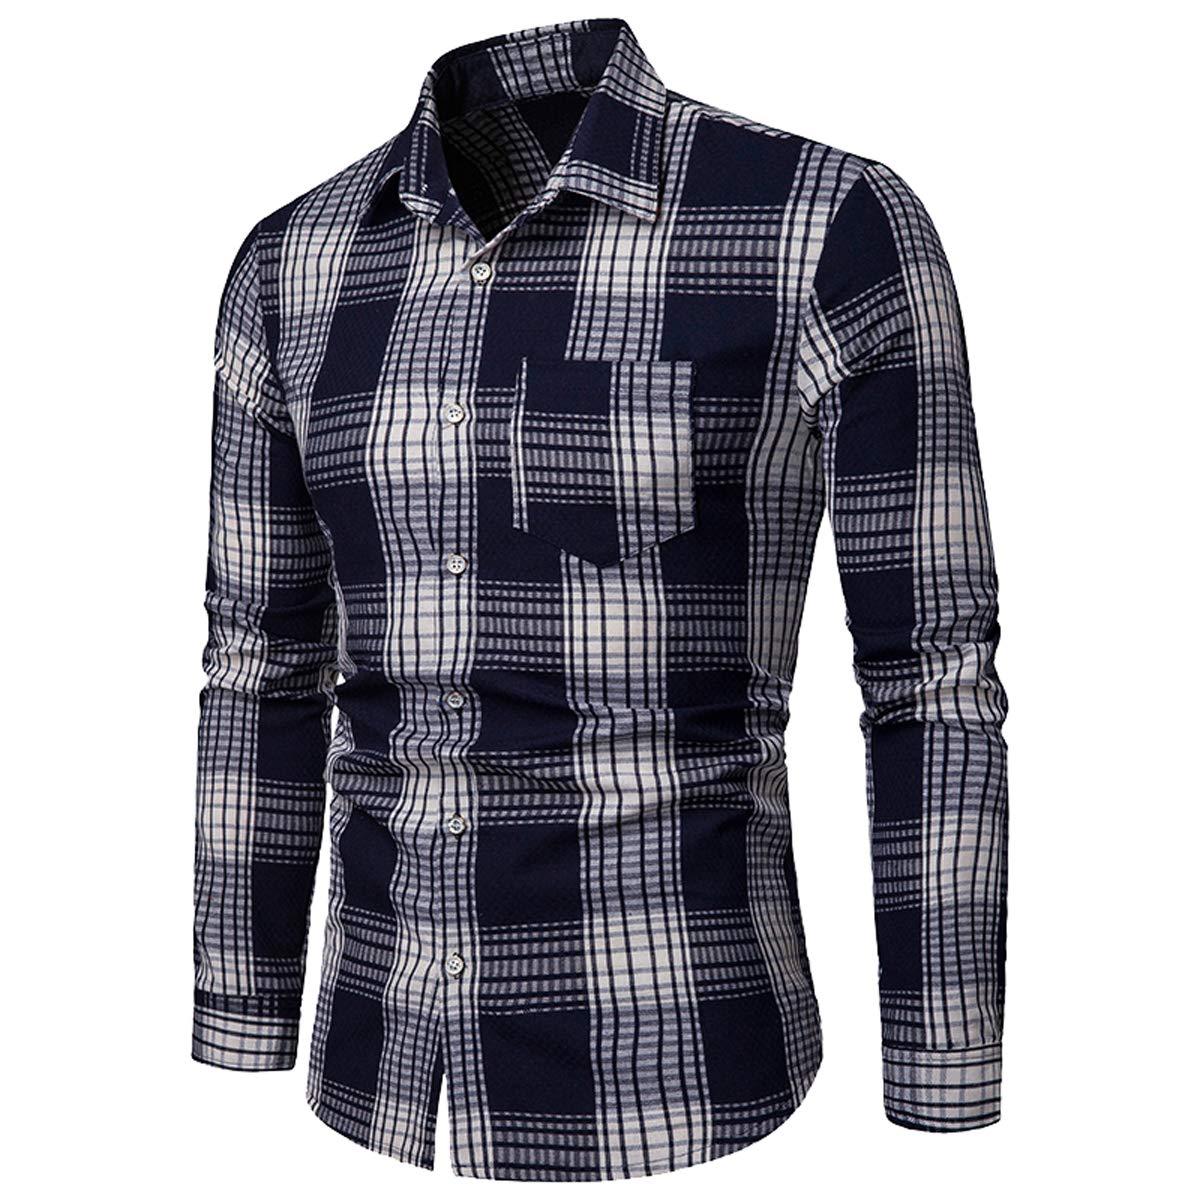 2018 Trend Mens Long-Sleeved Plaid Shirt Classic Casual Shirt